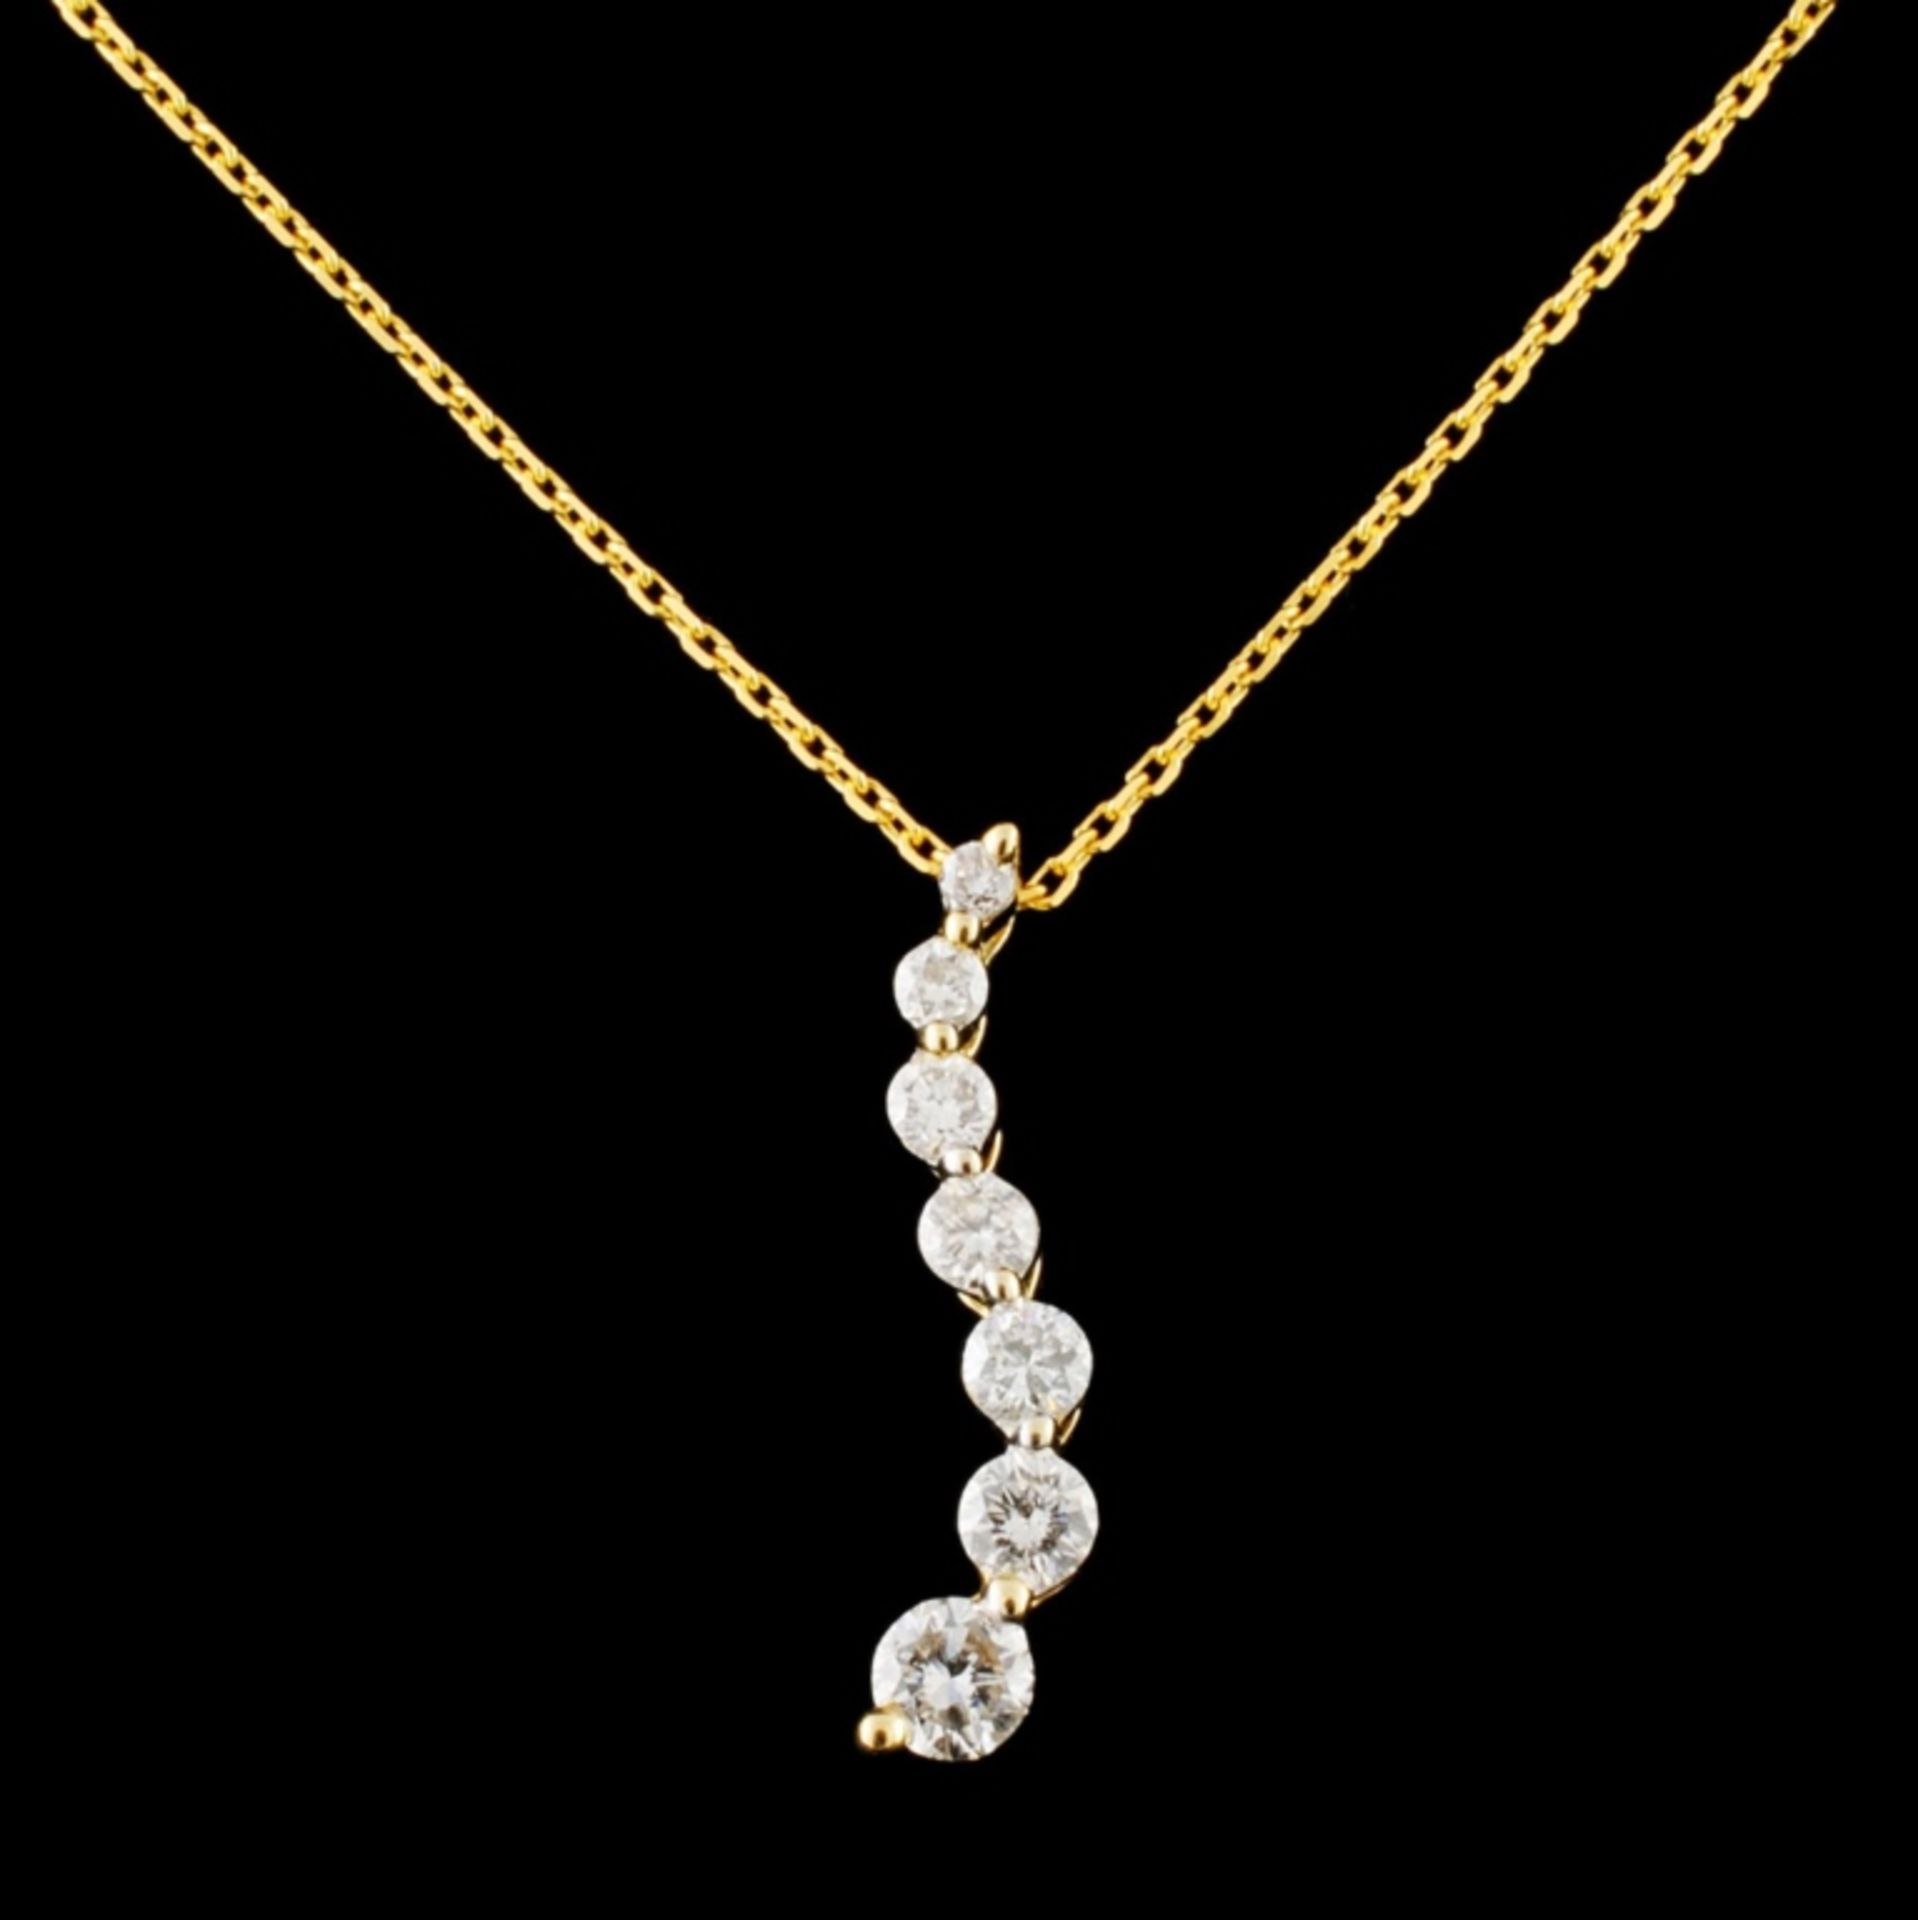 14K Gold 0.28ctw Diamond Pendant